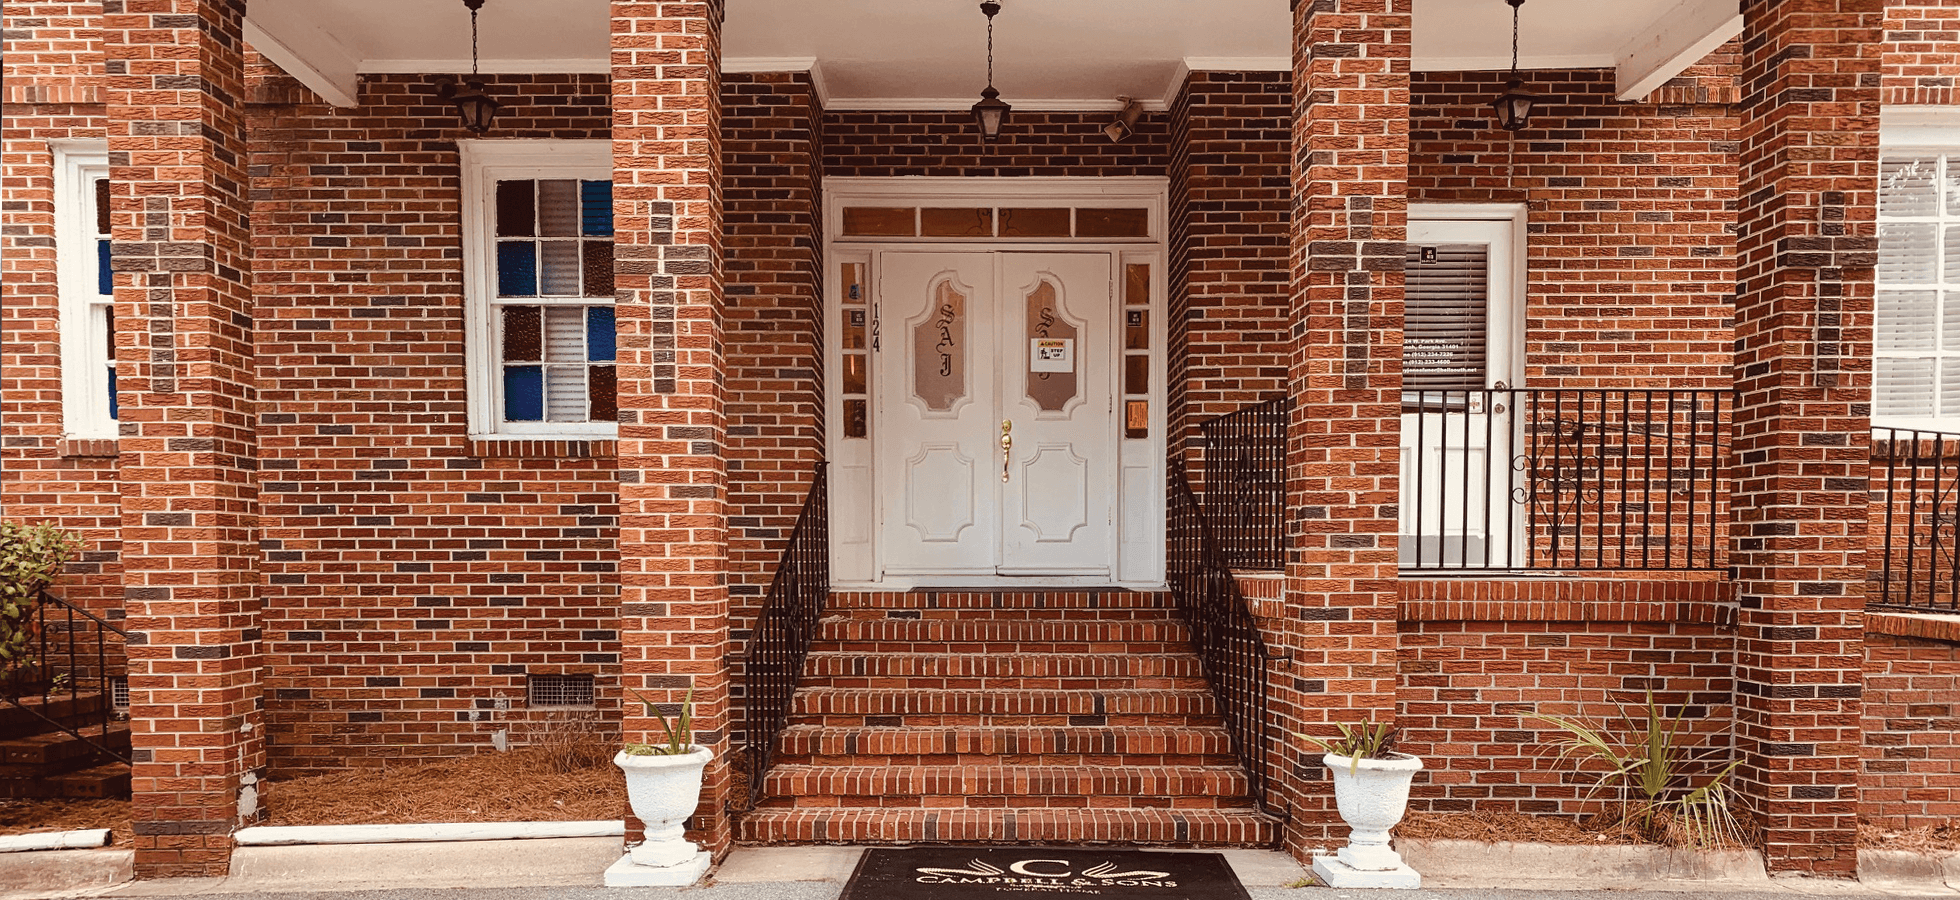 Campbell & Sons Funeral Home, Inc  | Savannah GA funeral